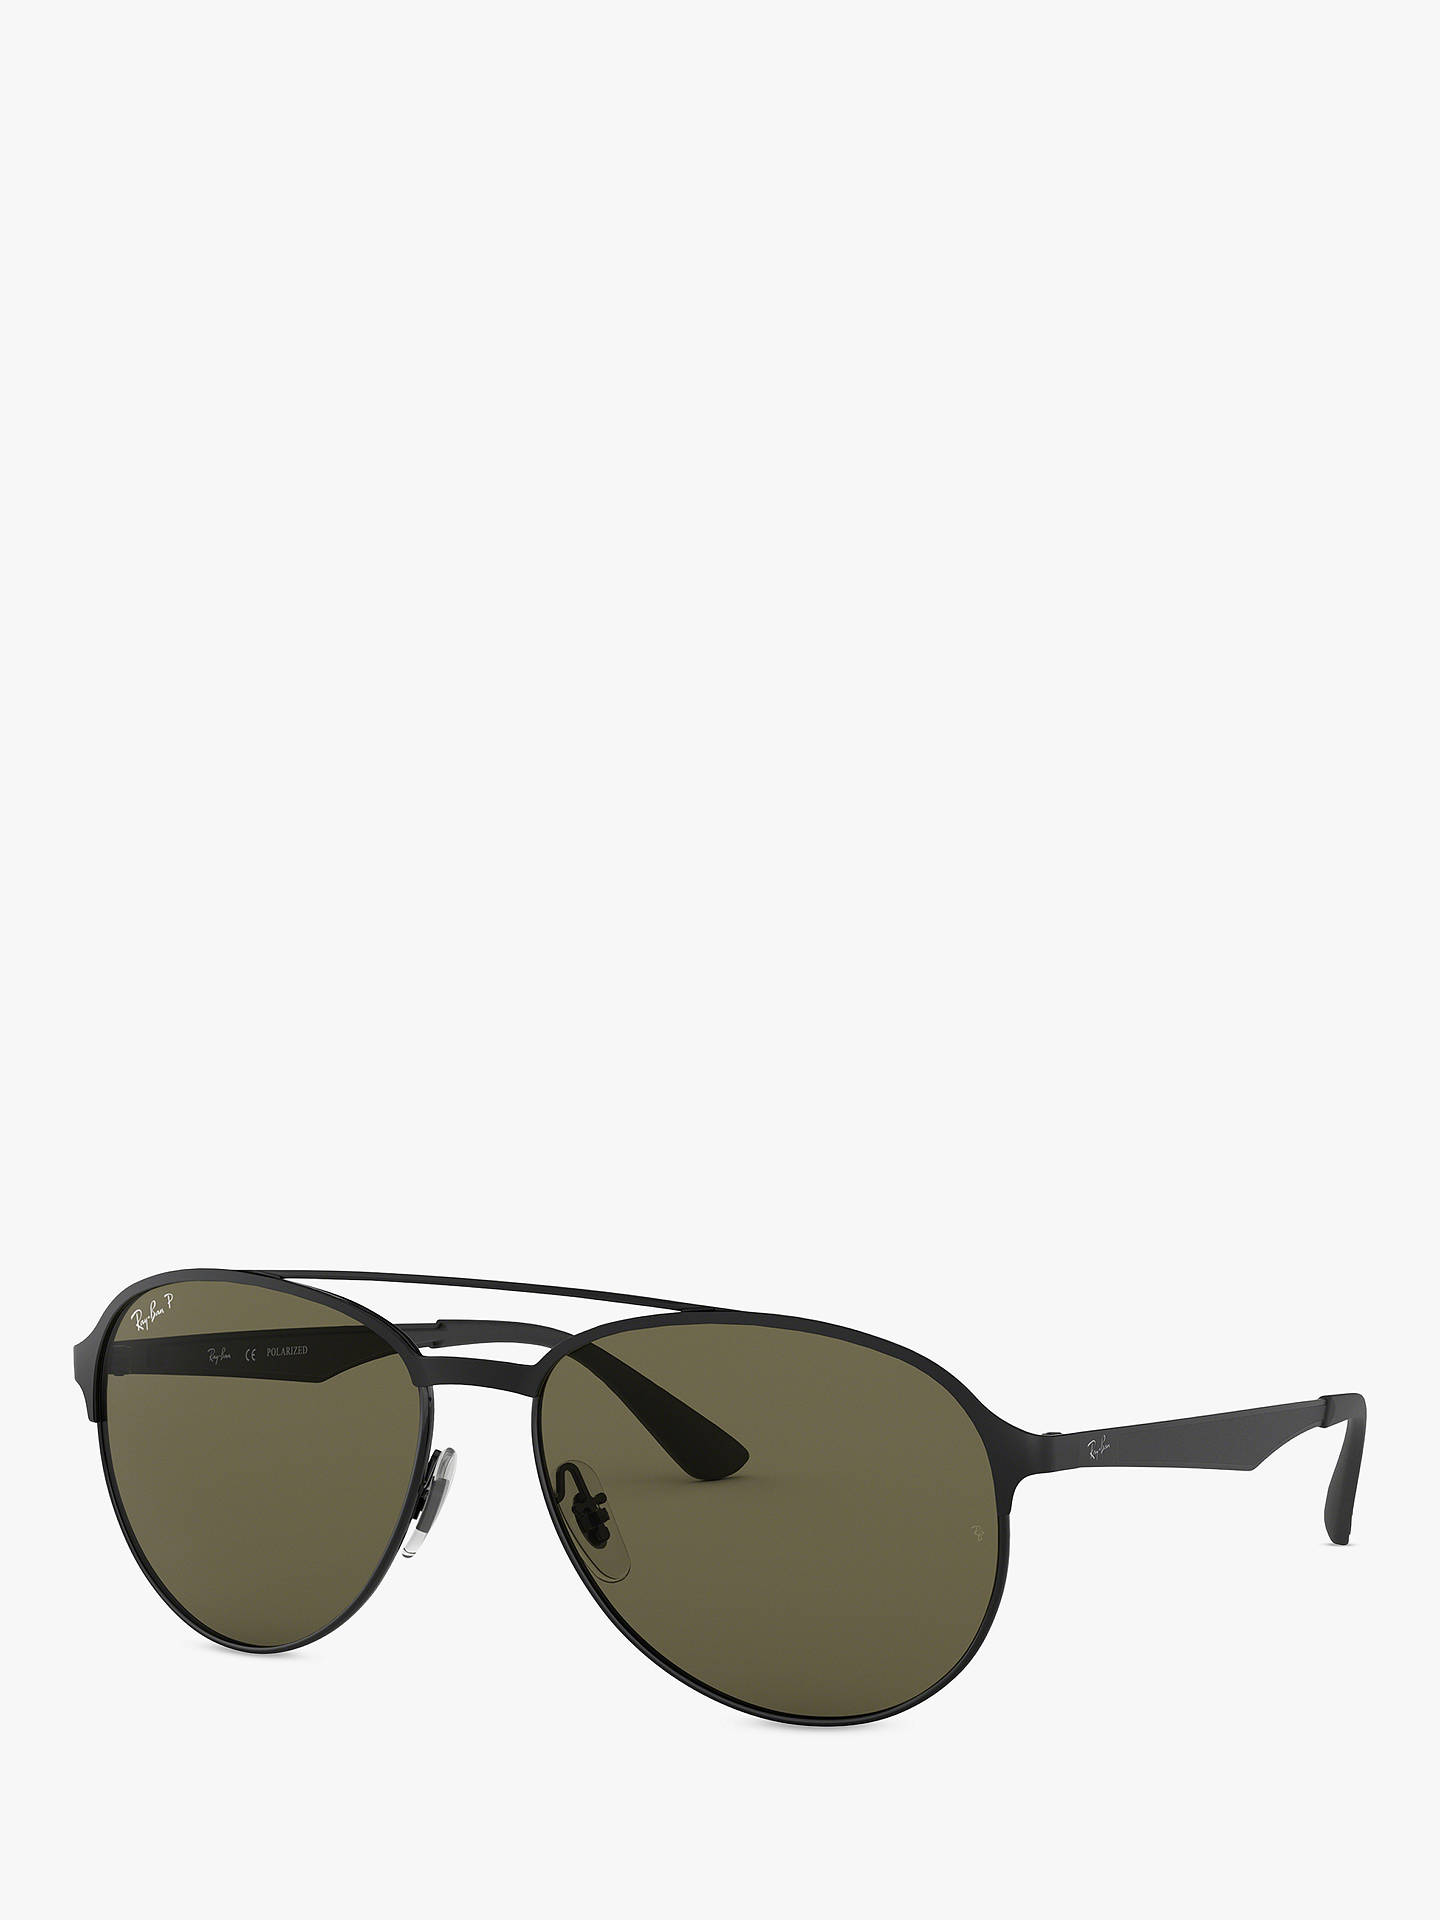 a534c71c4524 Buy Ray-Ban RB3606 Men s Polarised Aviator Sunglasses